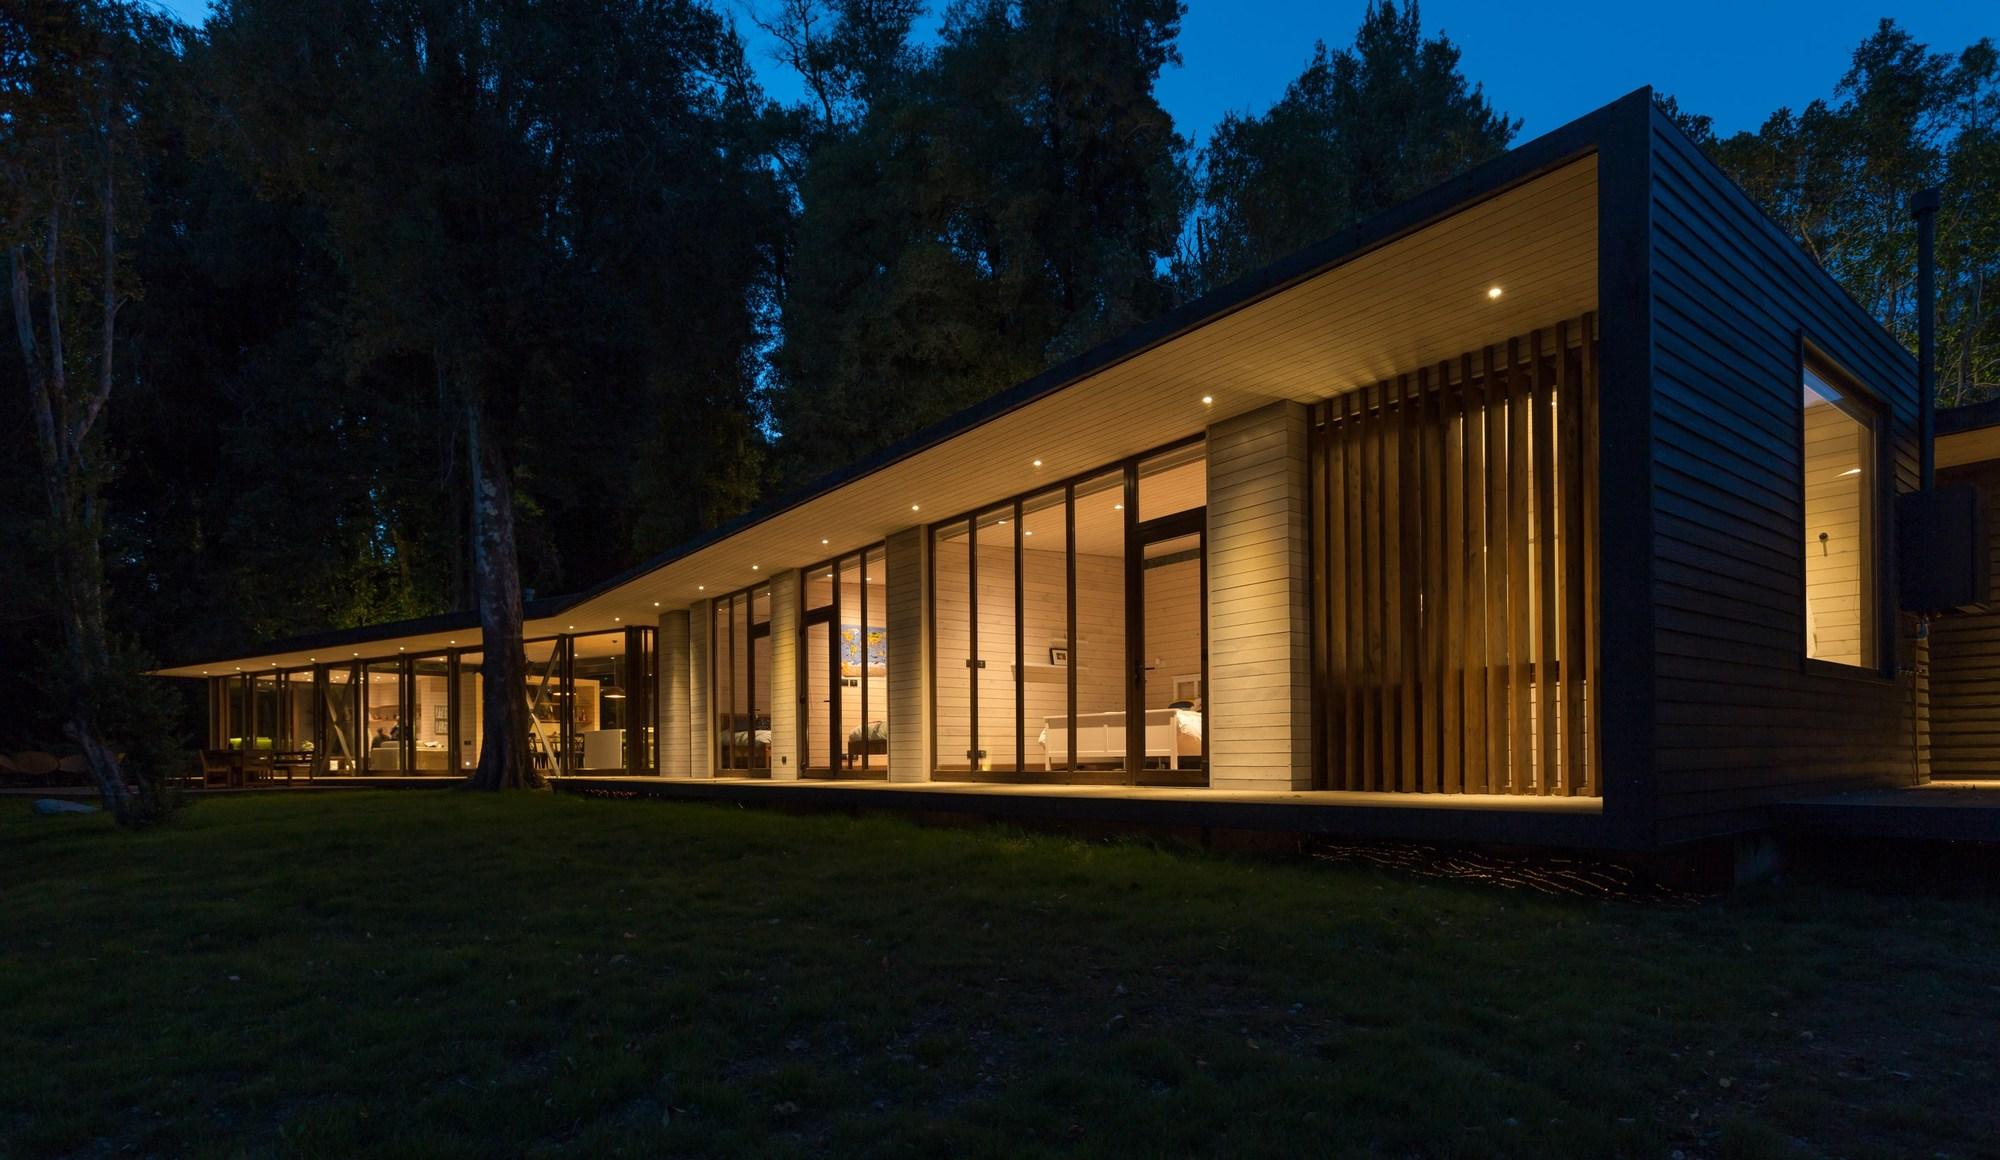 Galeria de casa no lago villarrica planmaestro 17 for Comprare casa al lago